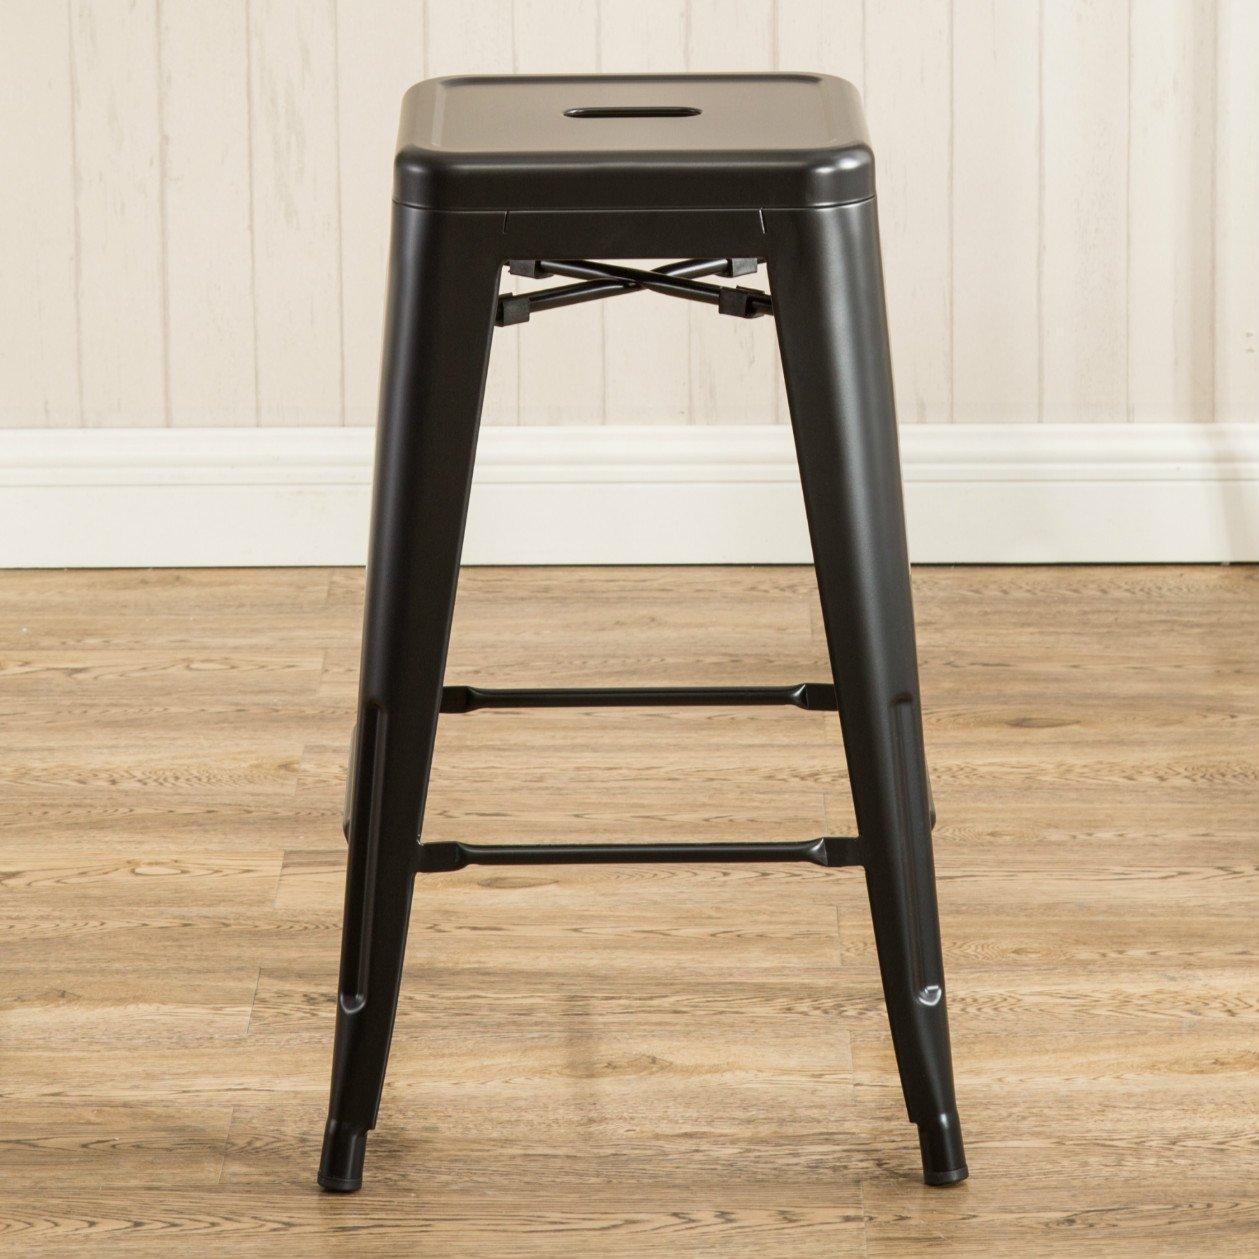 Wondrous 26 Inch Backless Metal Counter Height Bar Stools Set Of 2 Vintage Tolix Chairs Matt Black Evergreenethics Interior Chair Design Evergreenethicsorg